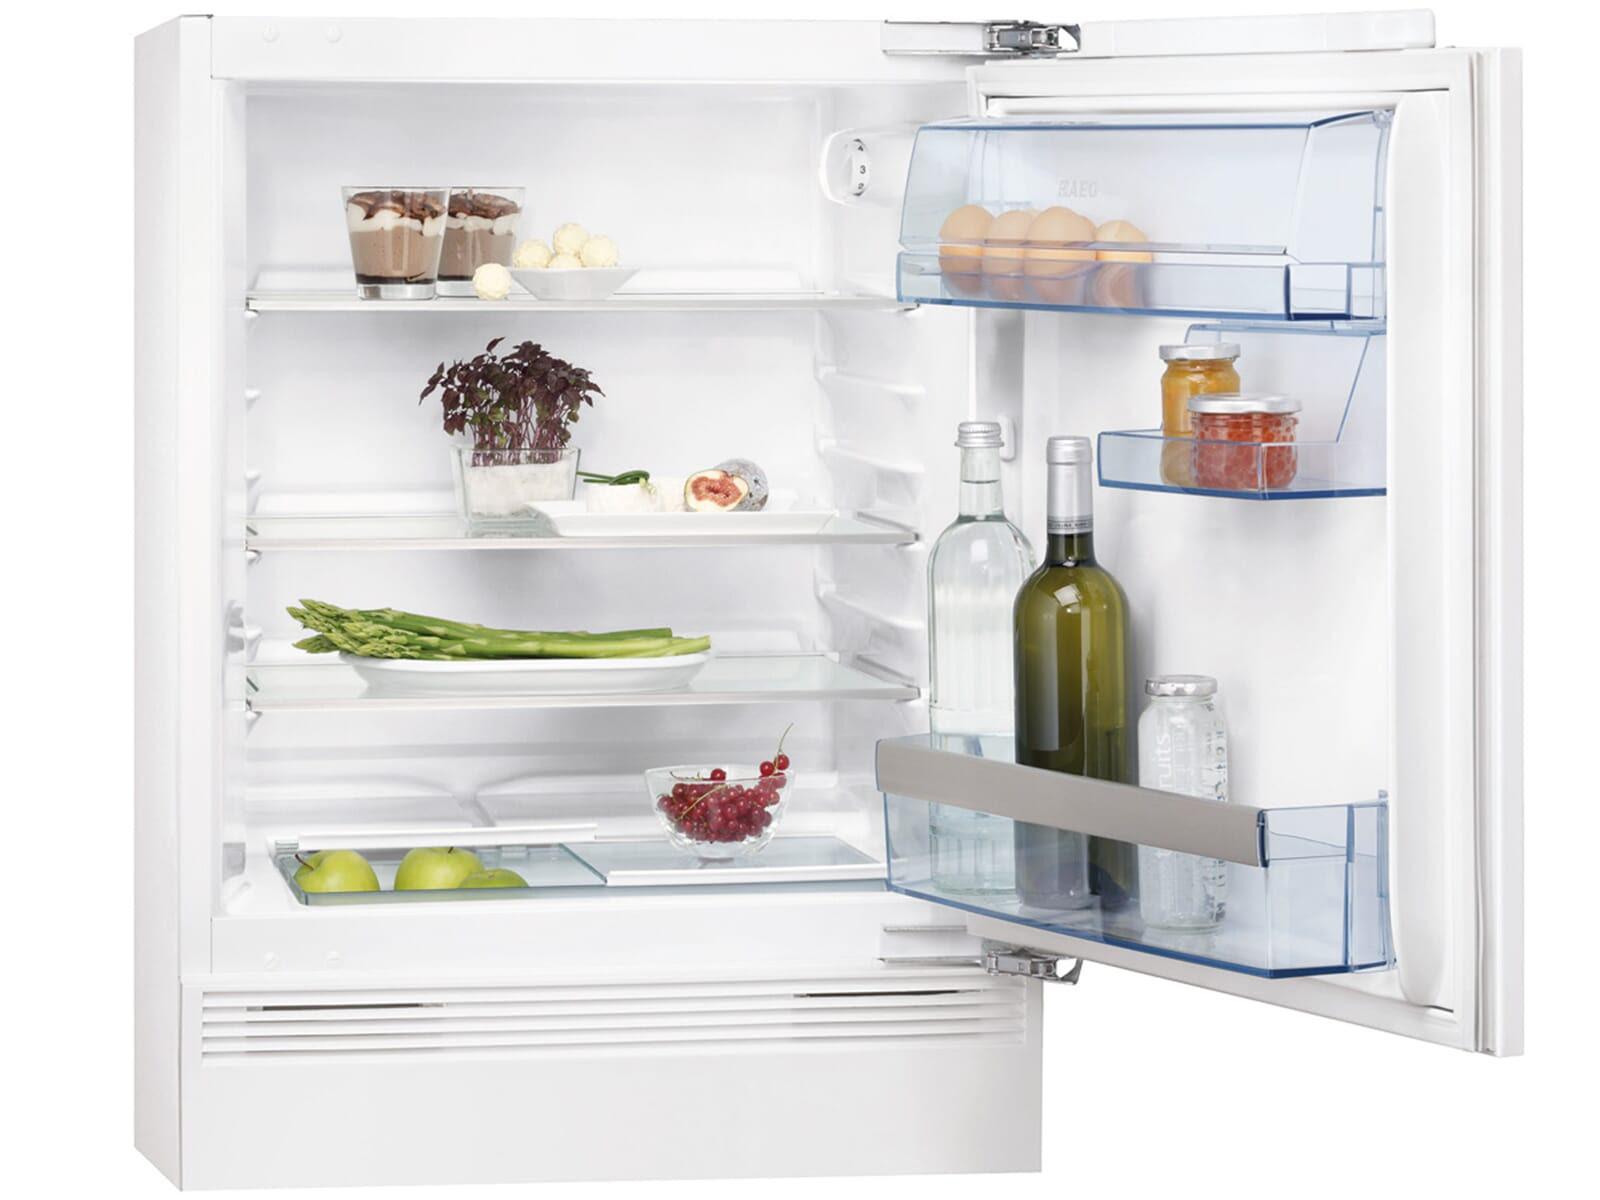 Siemens Kühlschrank Idealo : Unterbau kühlschrank marjorie anderson